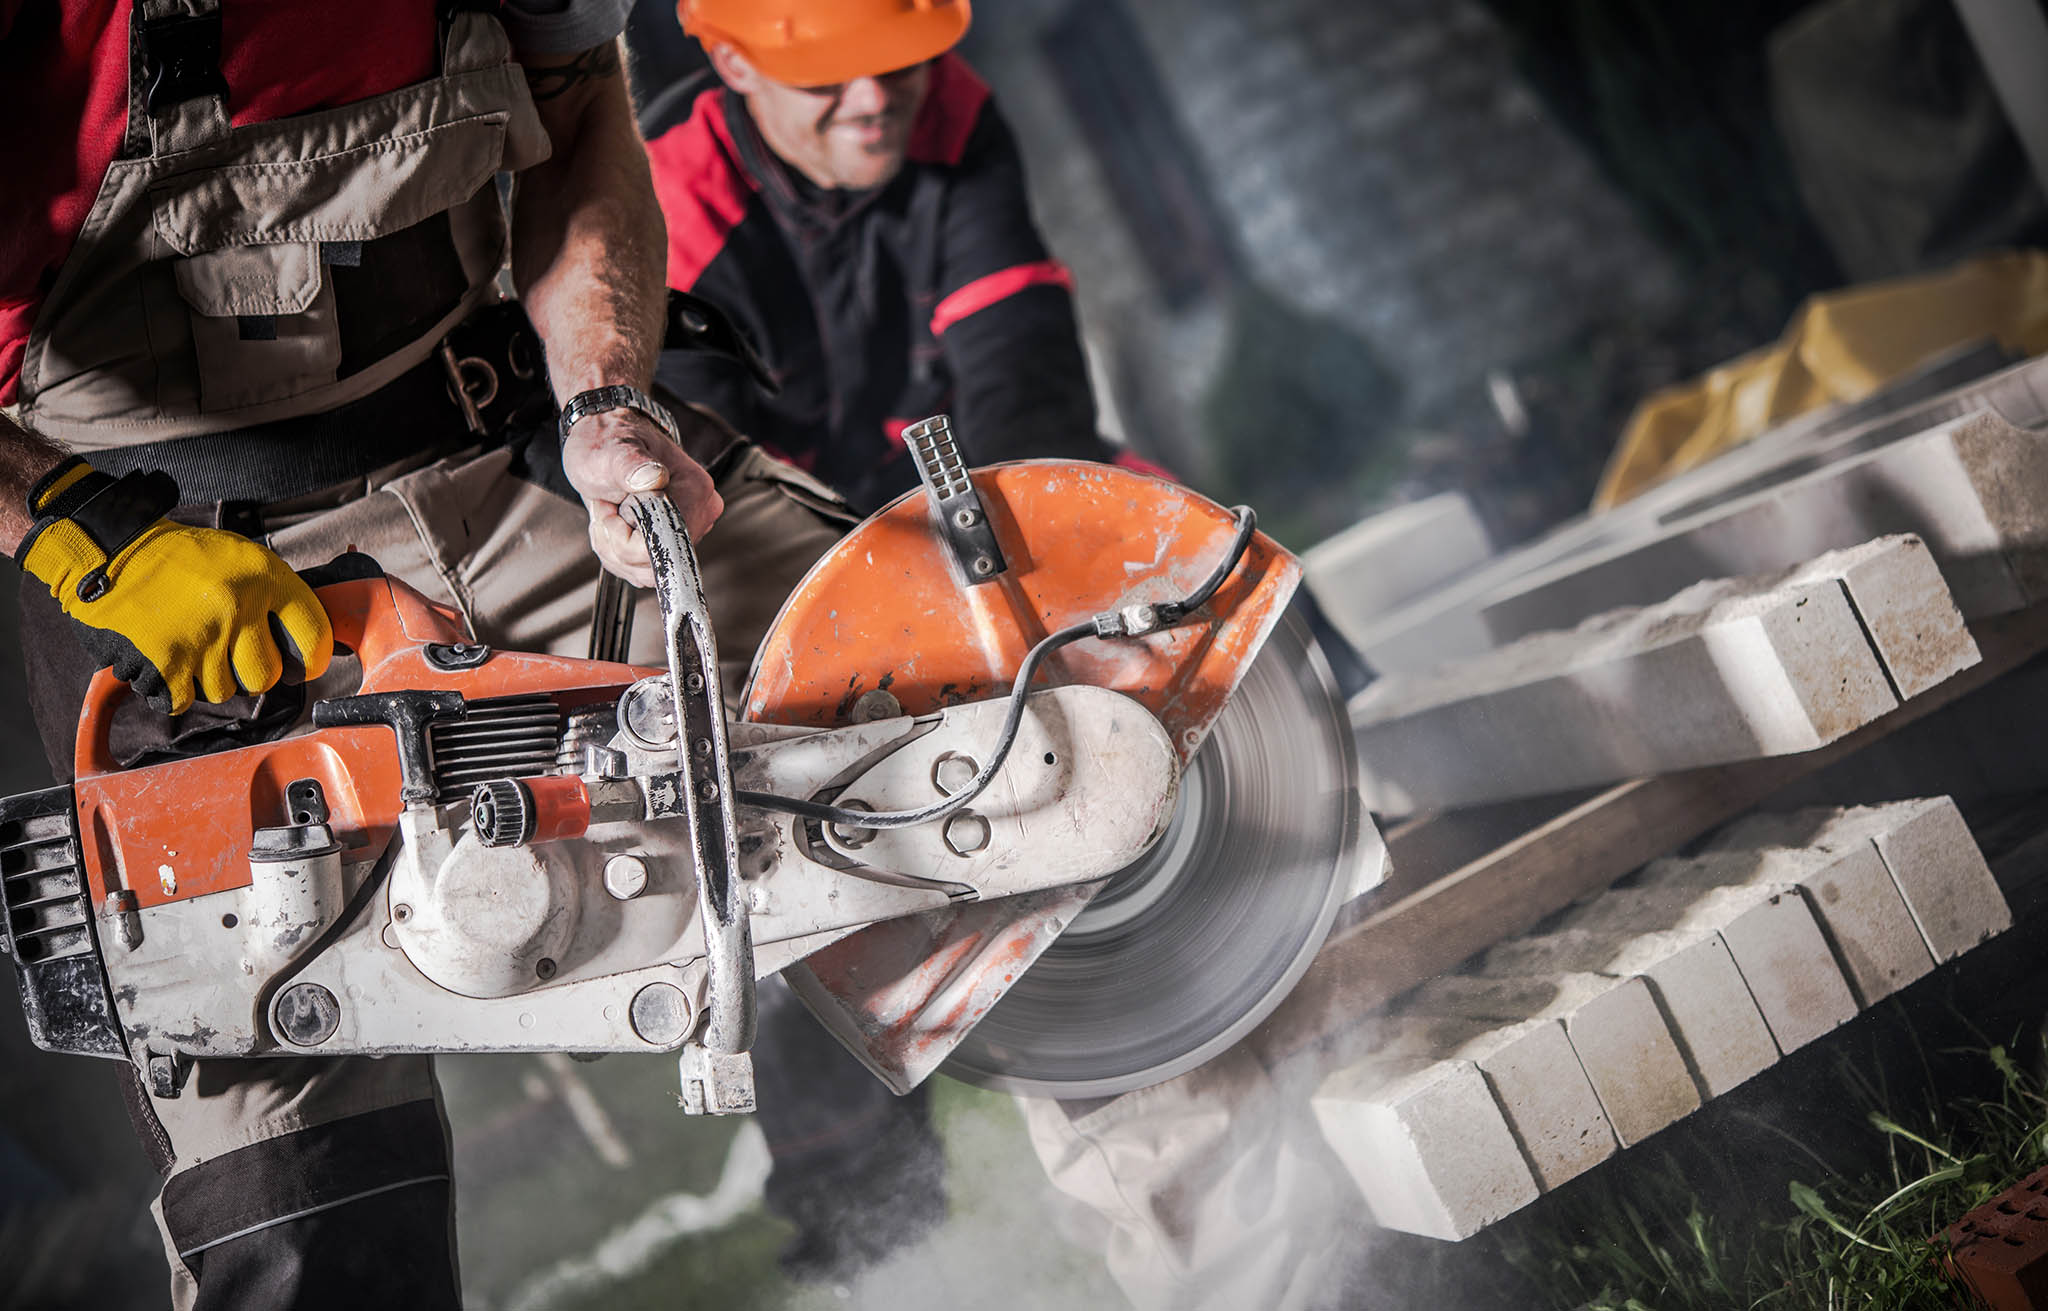 Eastern Concrete Cutting | Affordable Concrete Cutting